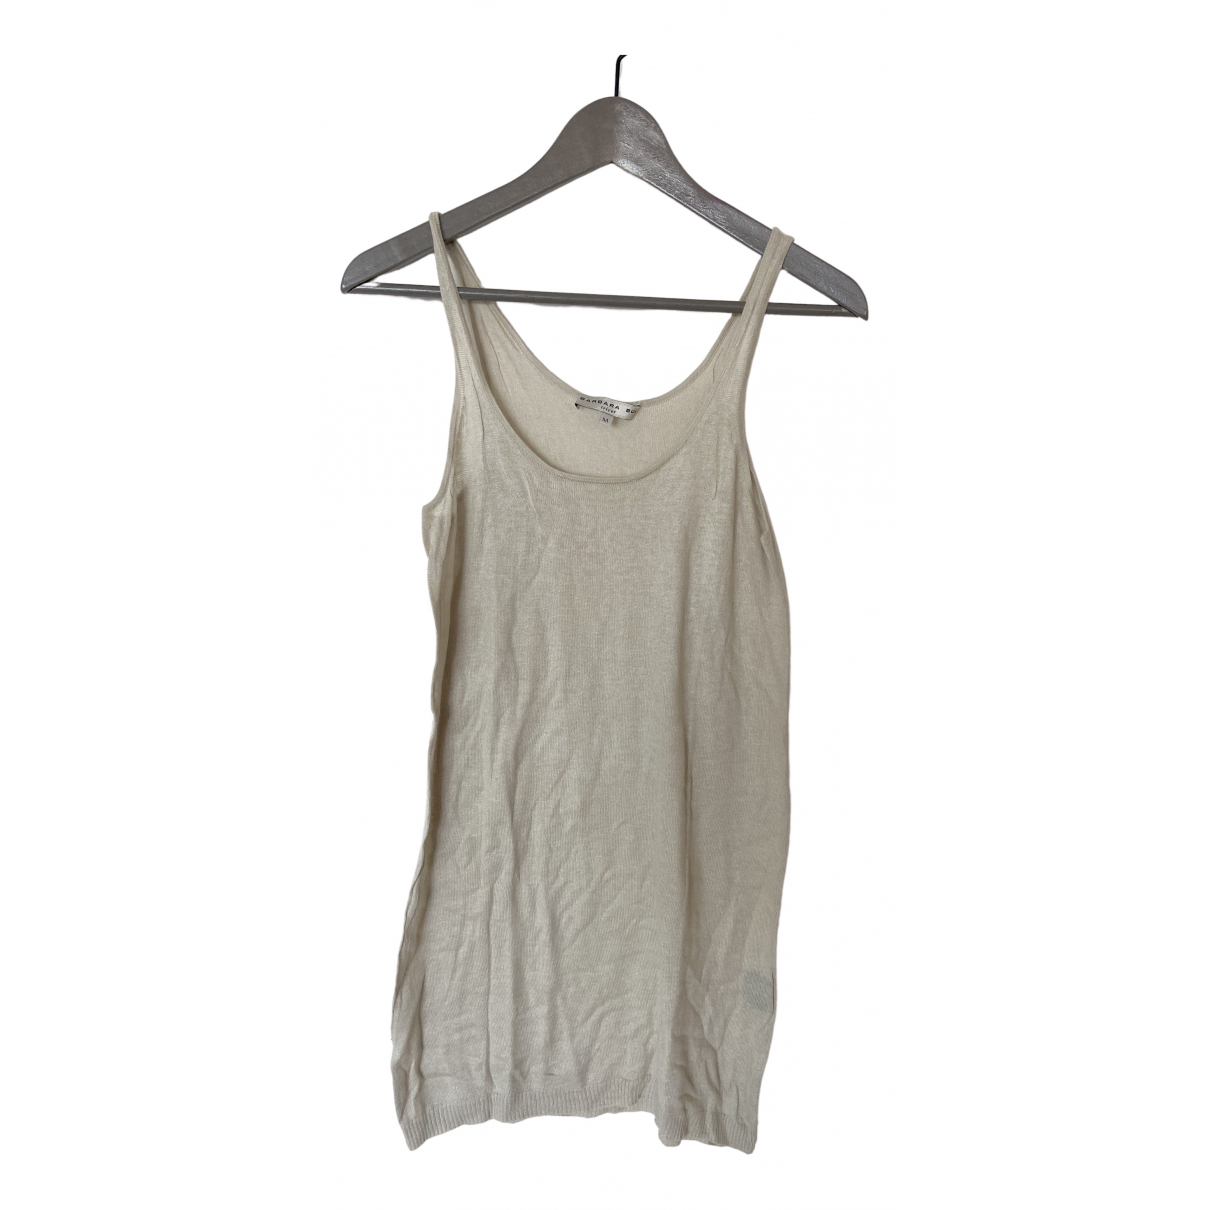 Barbara Bui \N Beige Cashmere Knitwear for Women M International